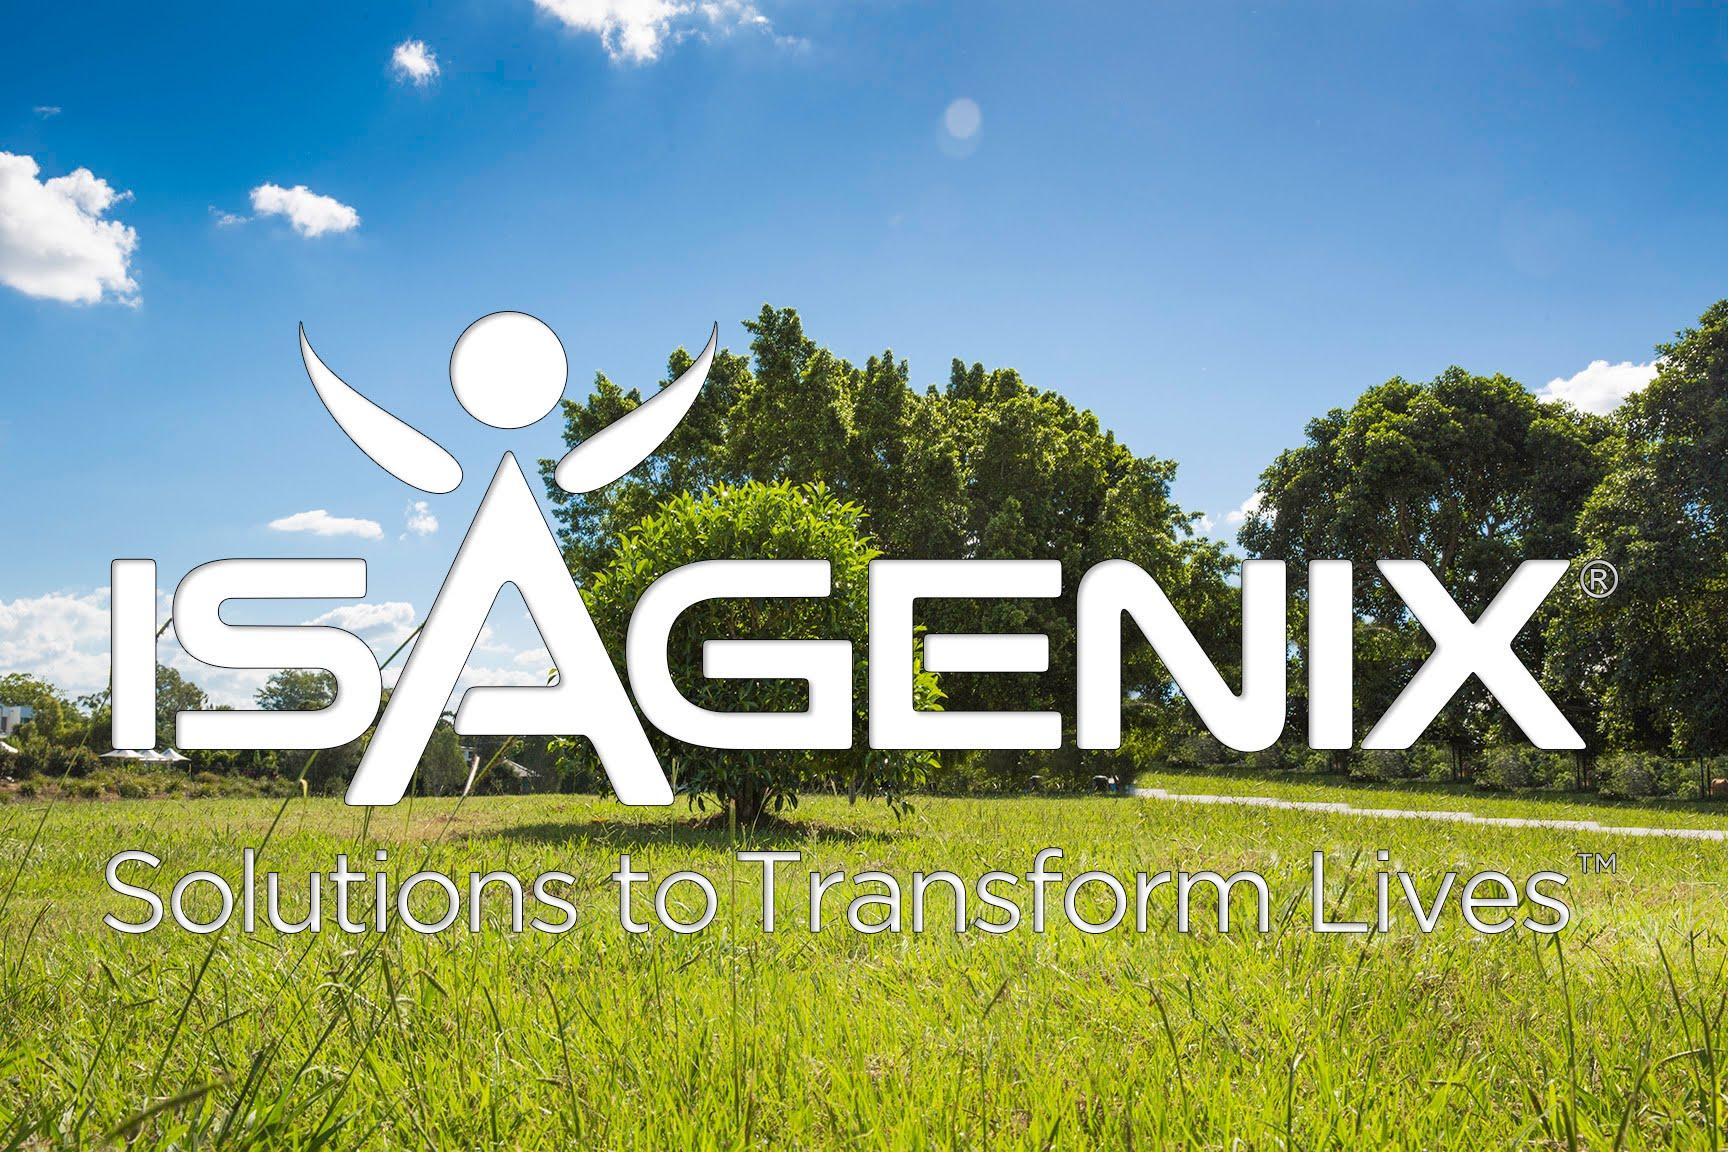 Isagenix Opportunity